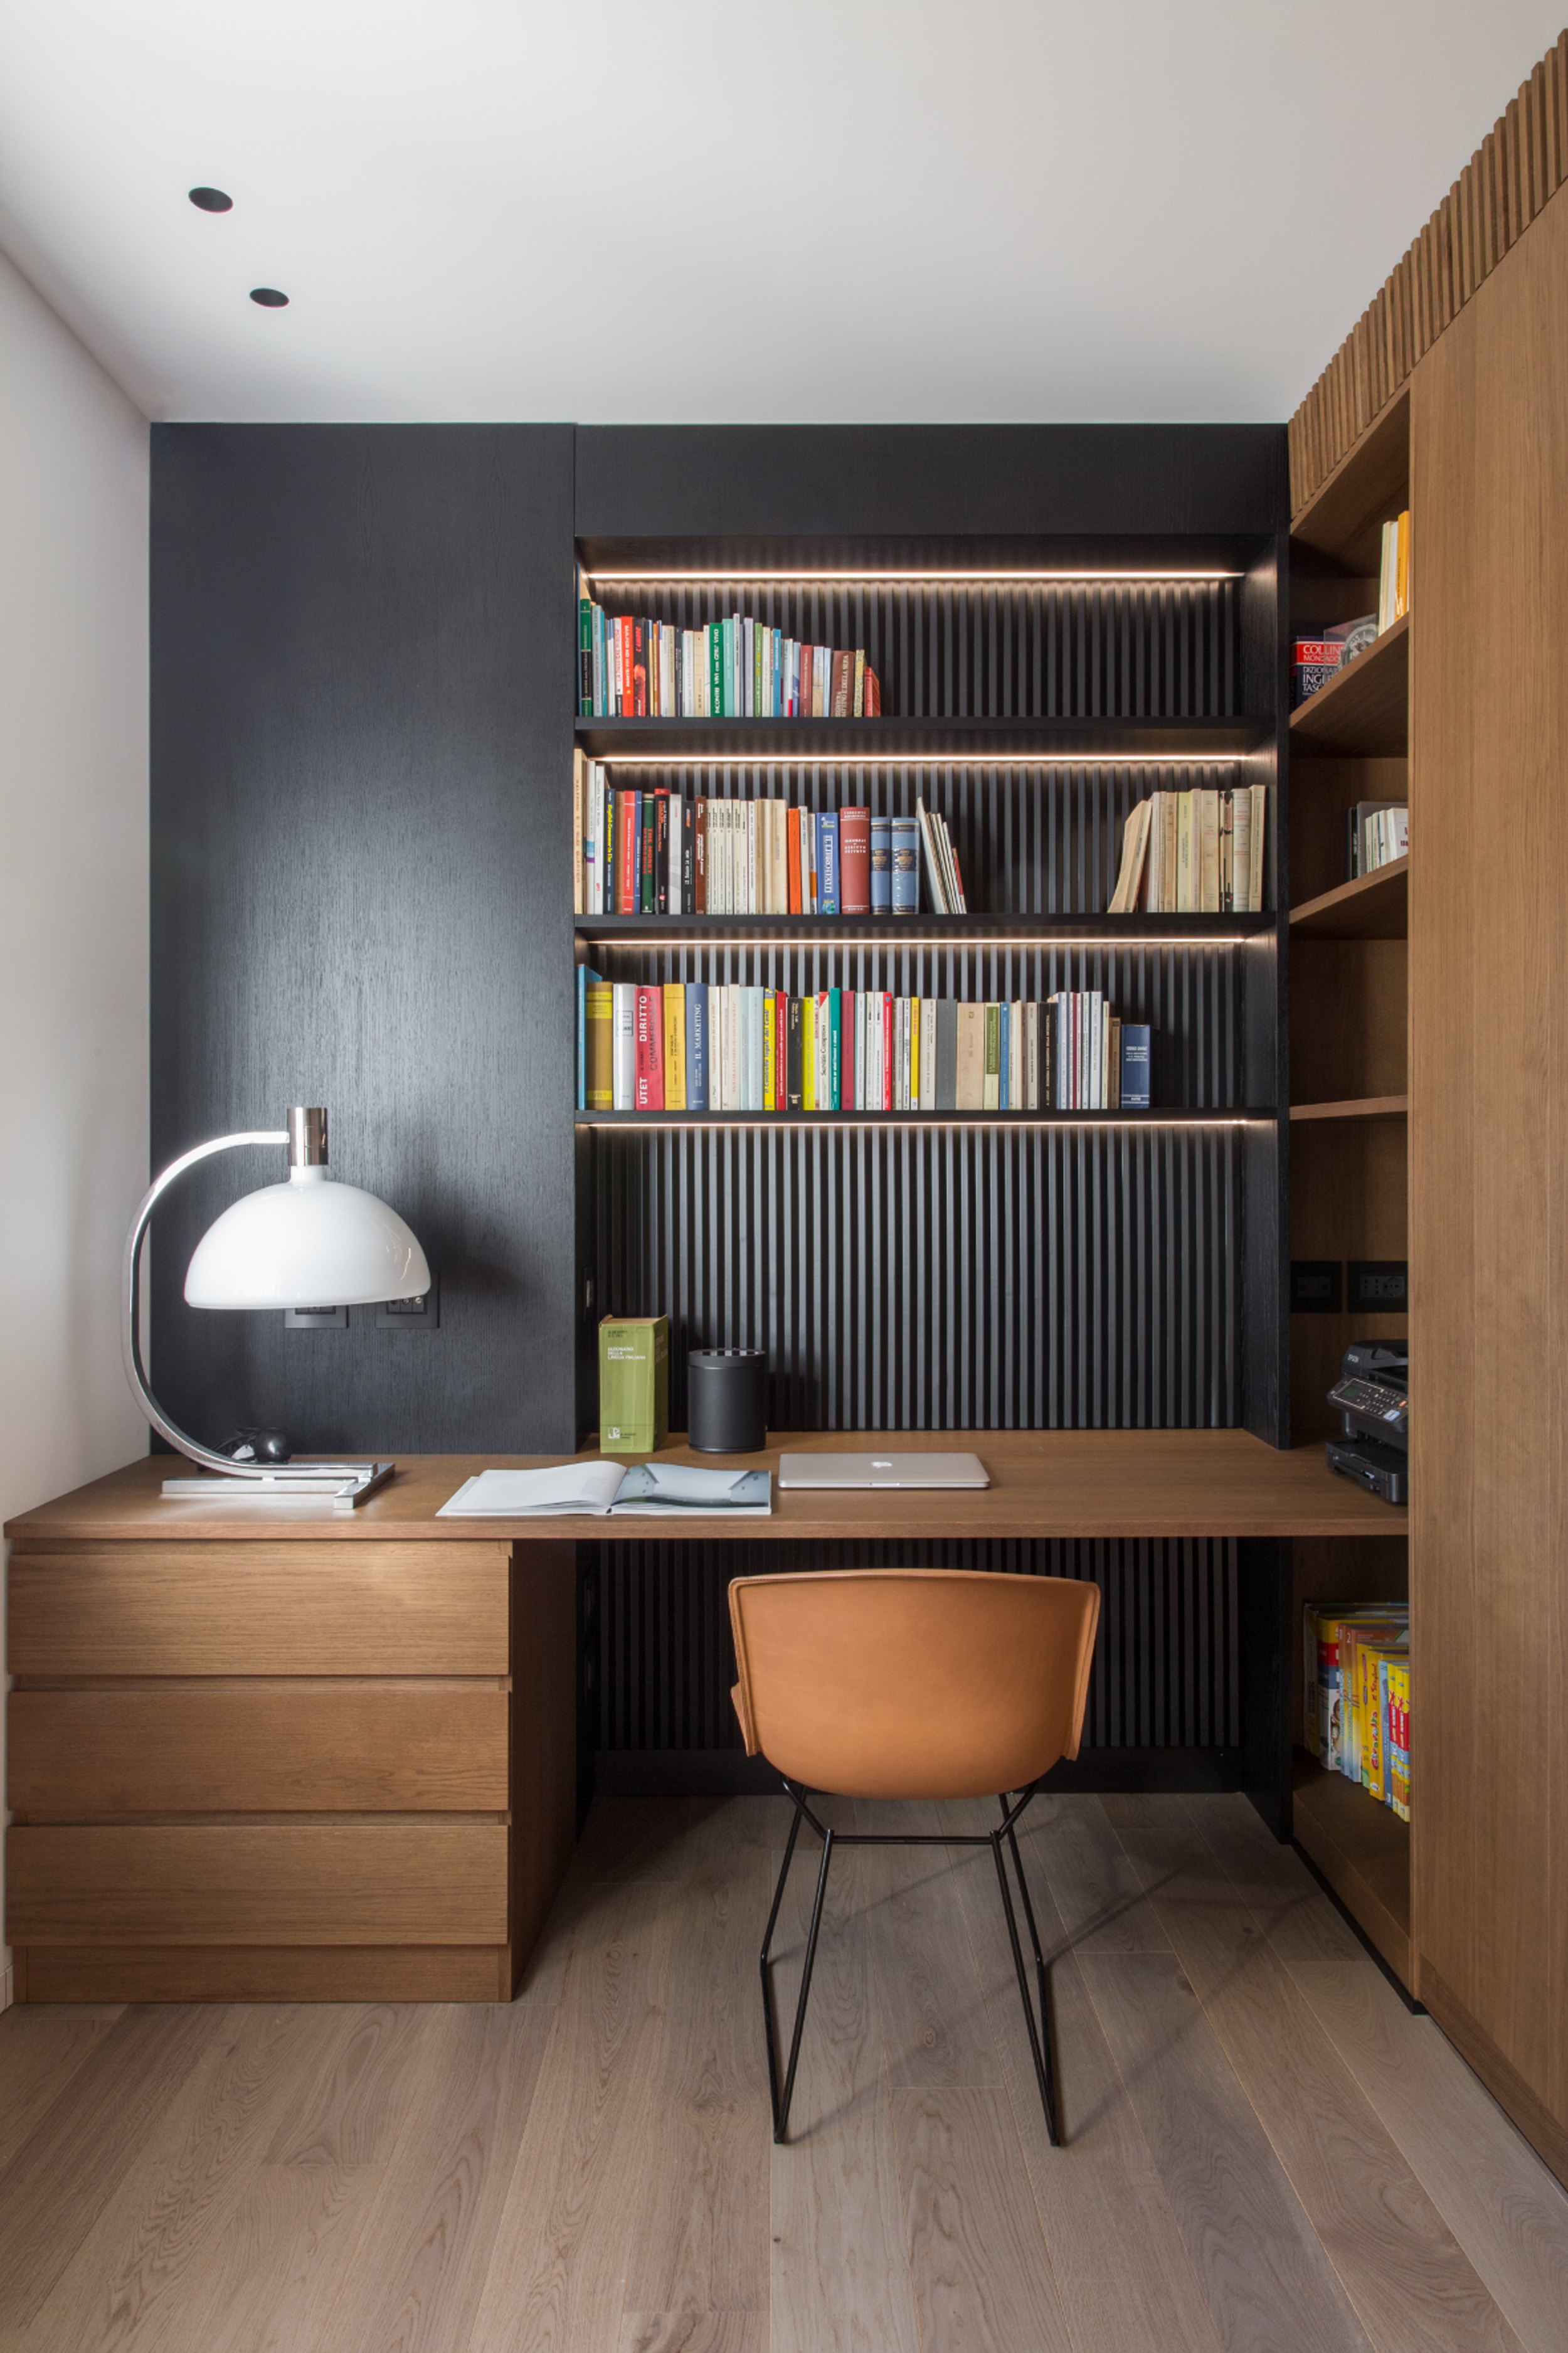 Study Room Interior: 20 Quiet Home Offices